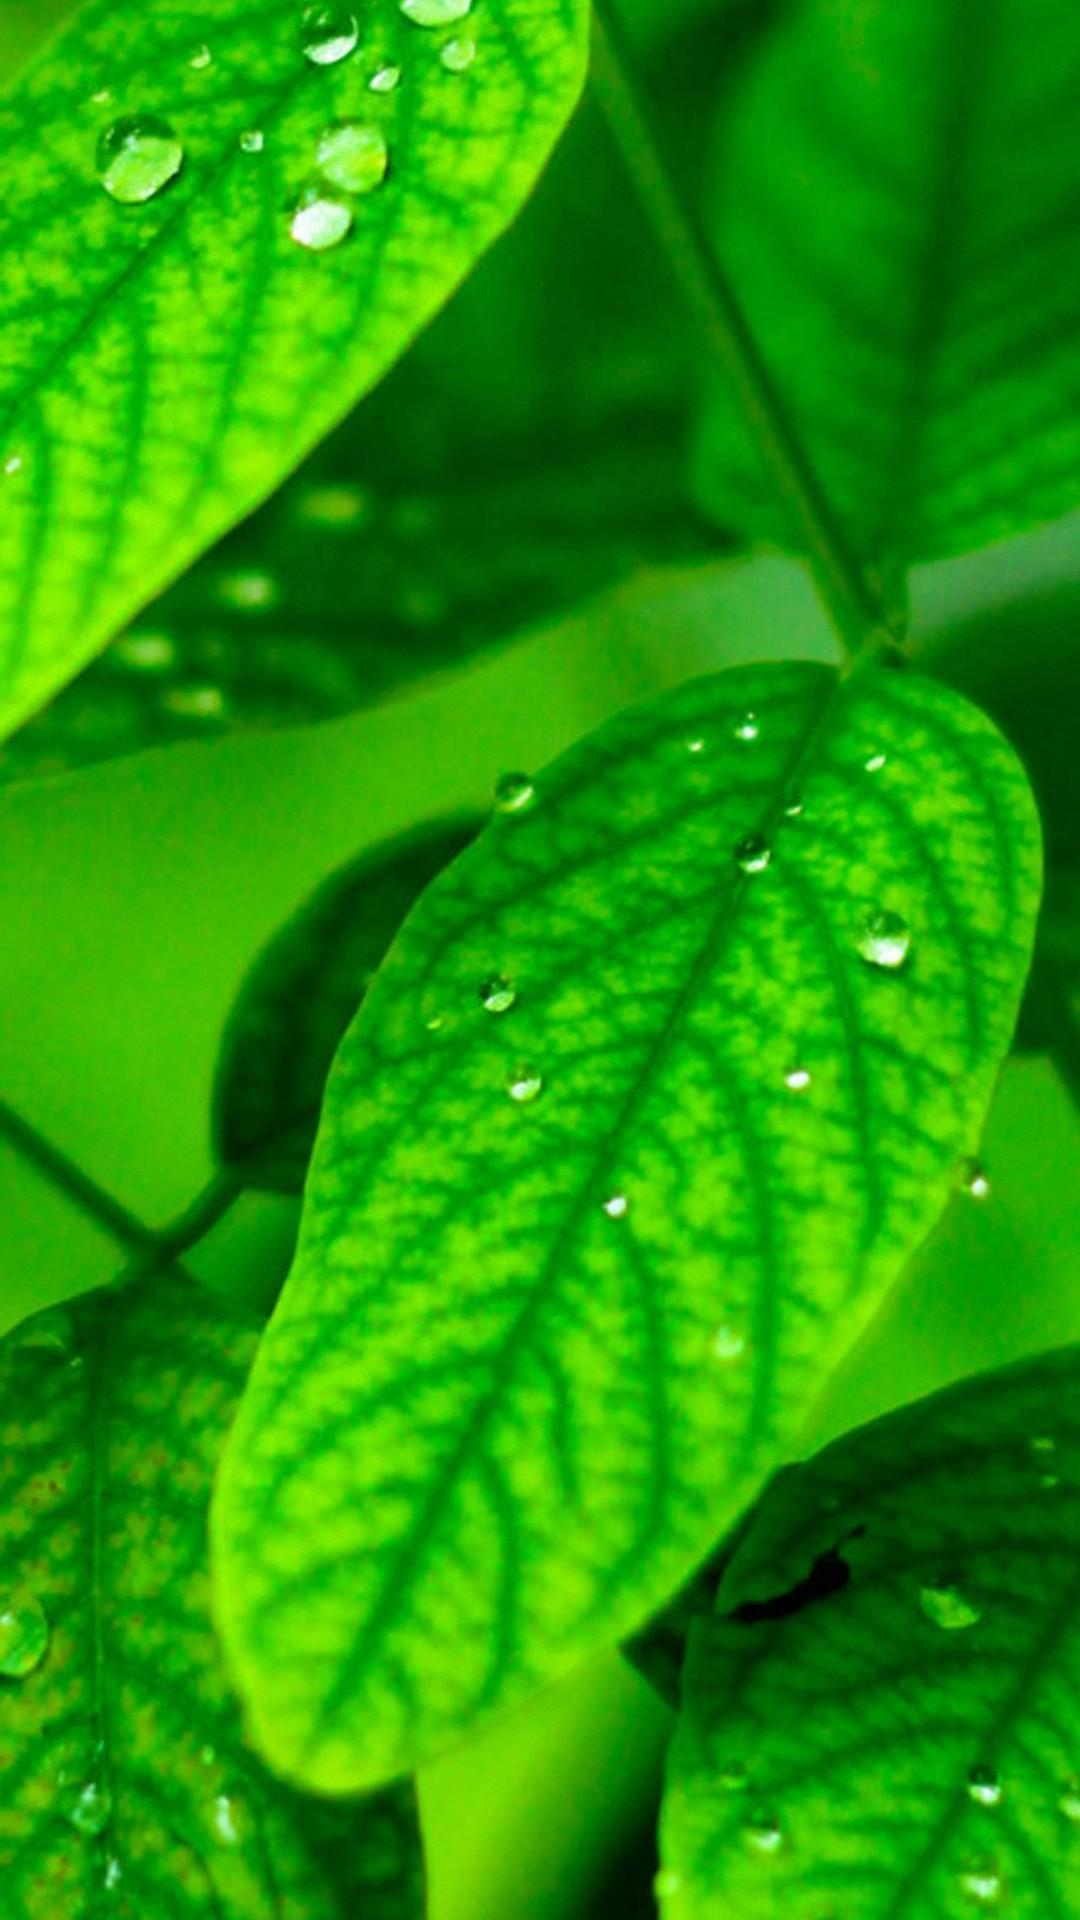 Banana Wallpaper Iphone 6 Green Leaf Wallpaper Hd 70 Images